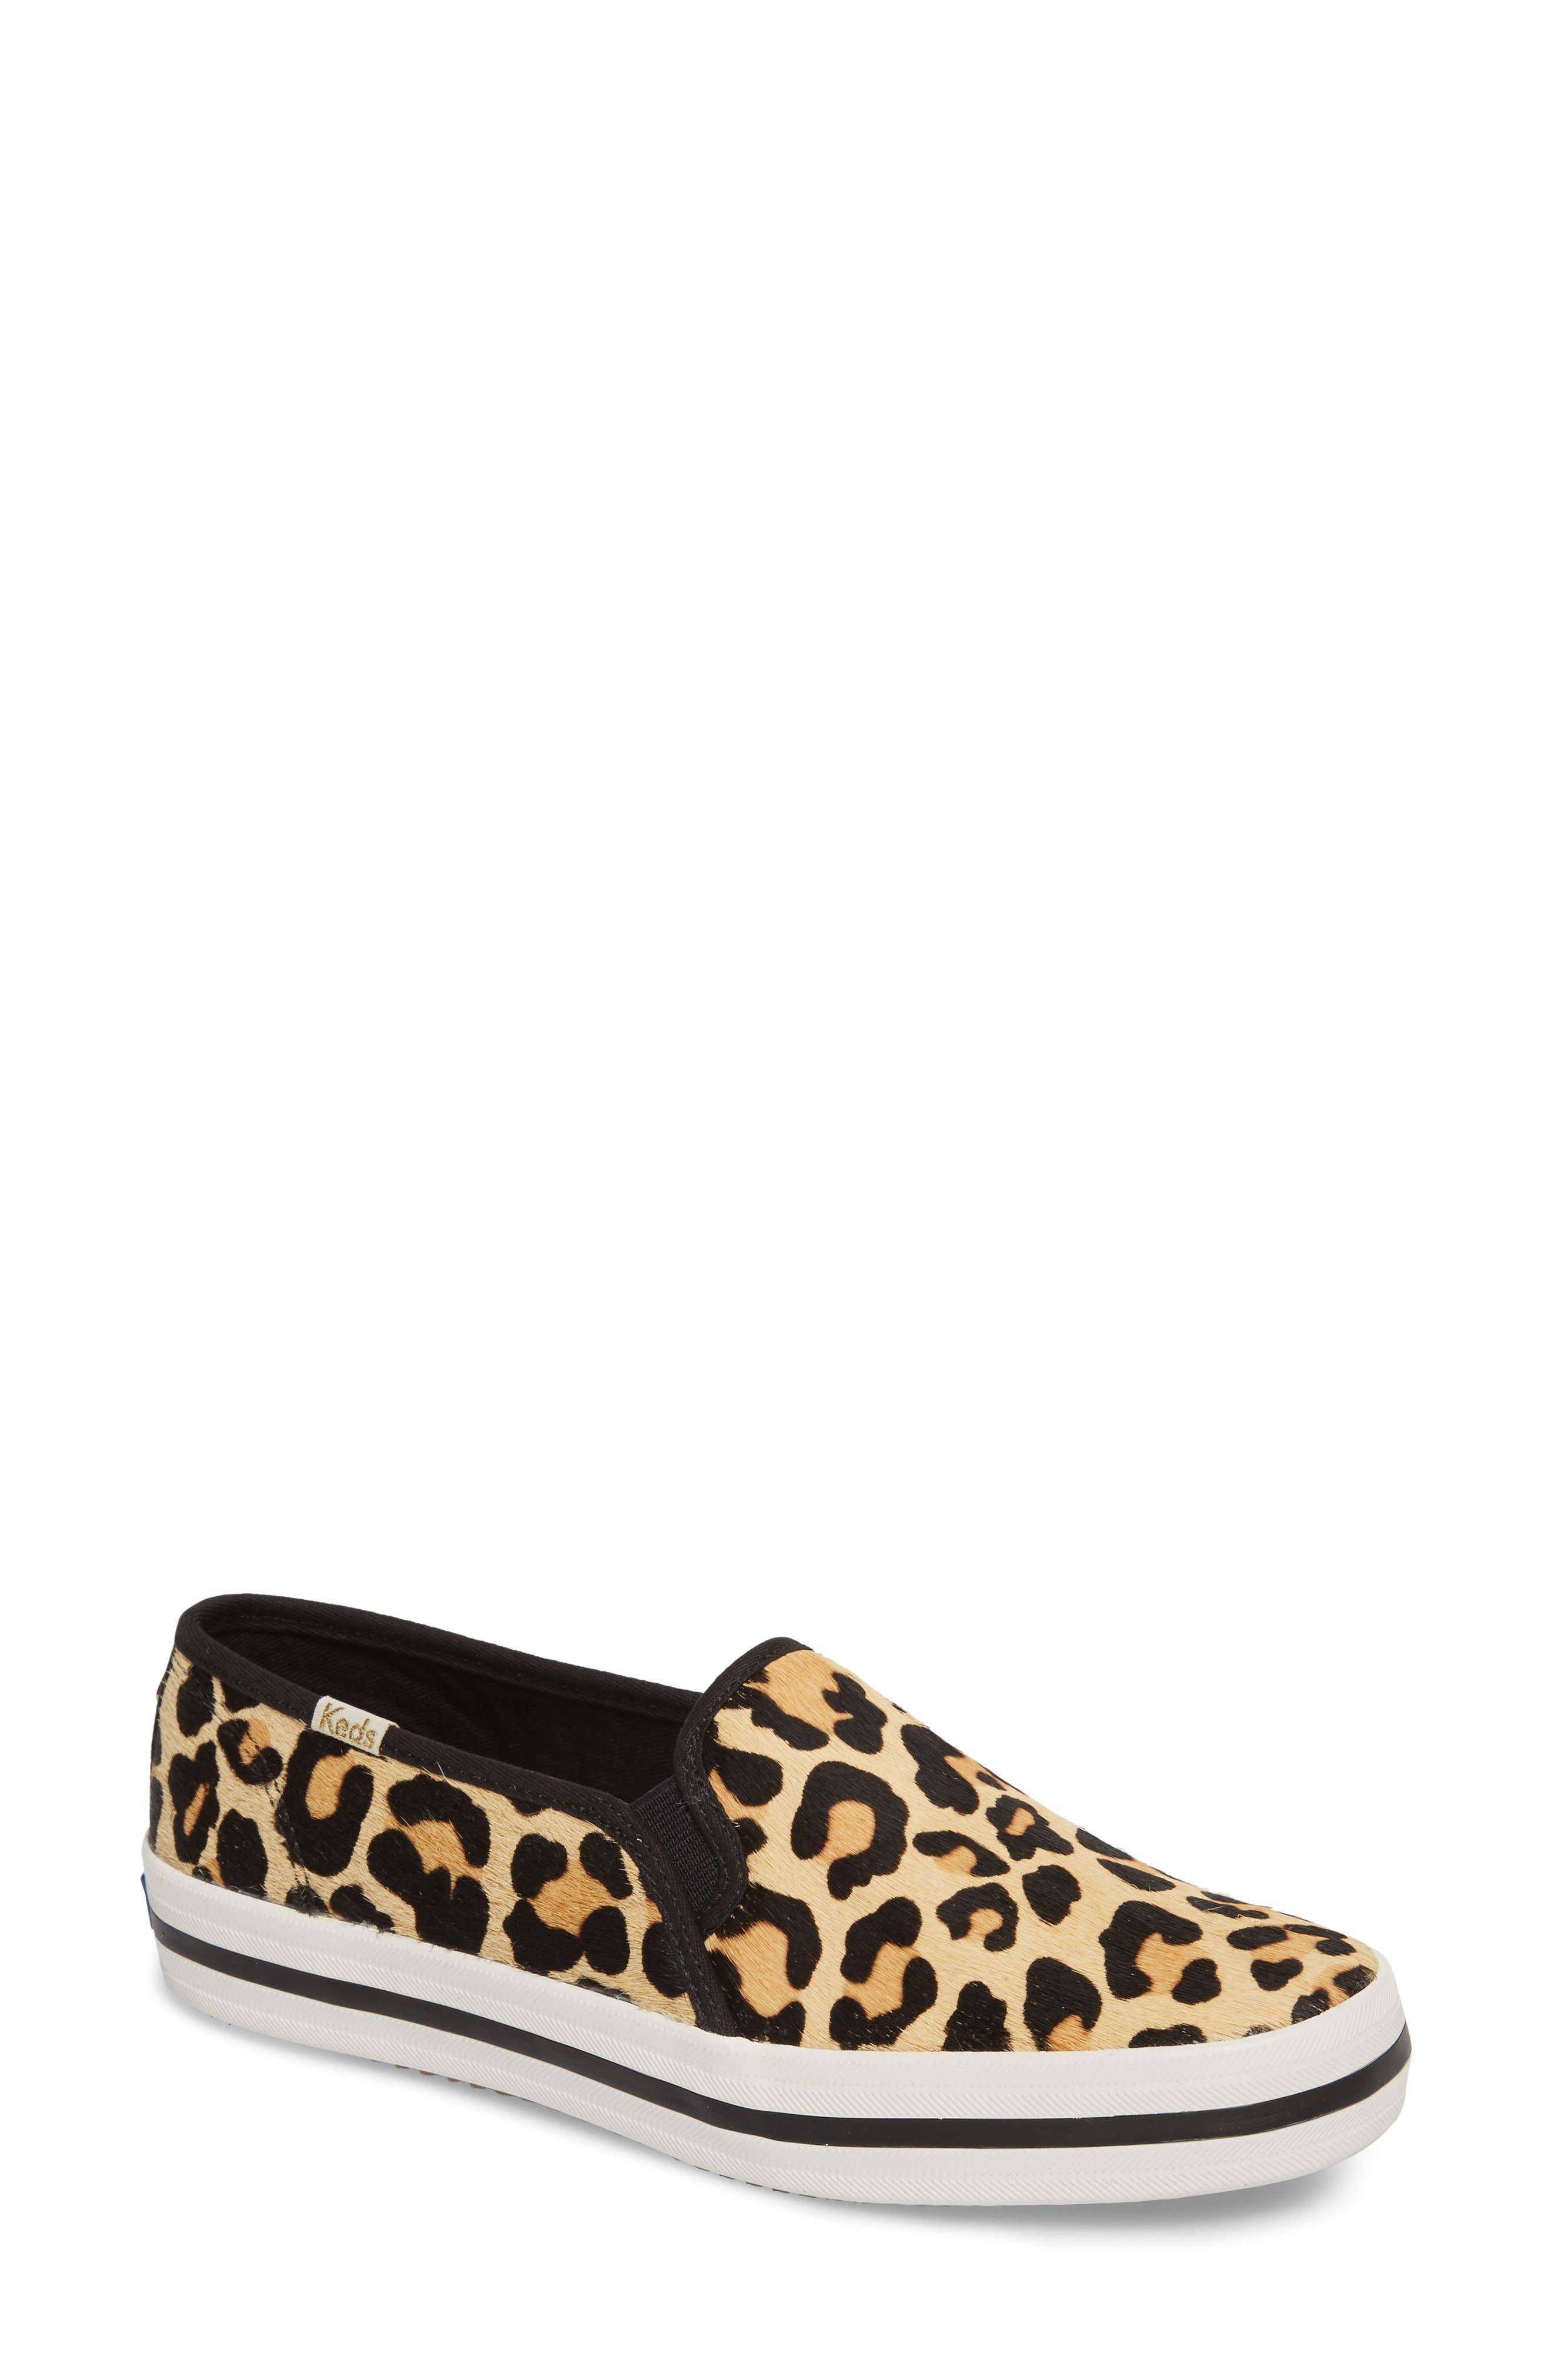 KEDS<SUP>®</SUP> FOR KATE SPADE NEW YORK Keds<sup>®</sup> x kate spade Double Decker Slip-On Sneaker, Main, color, TAN PONY HAIR